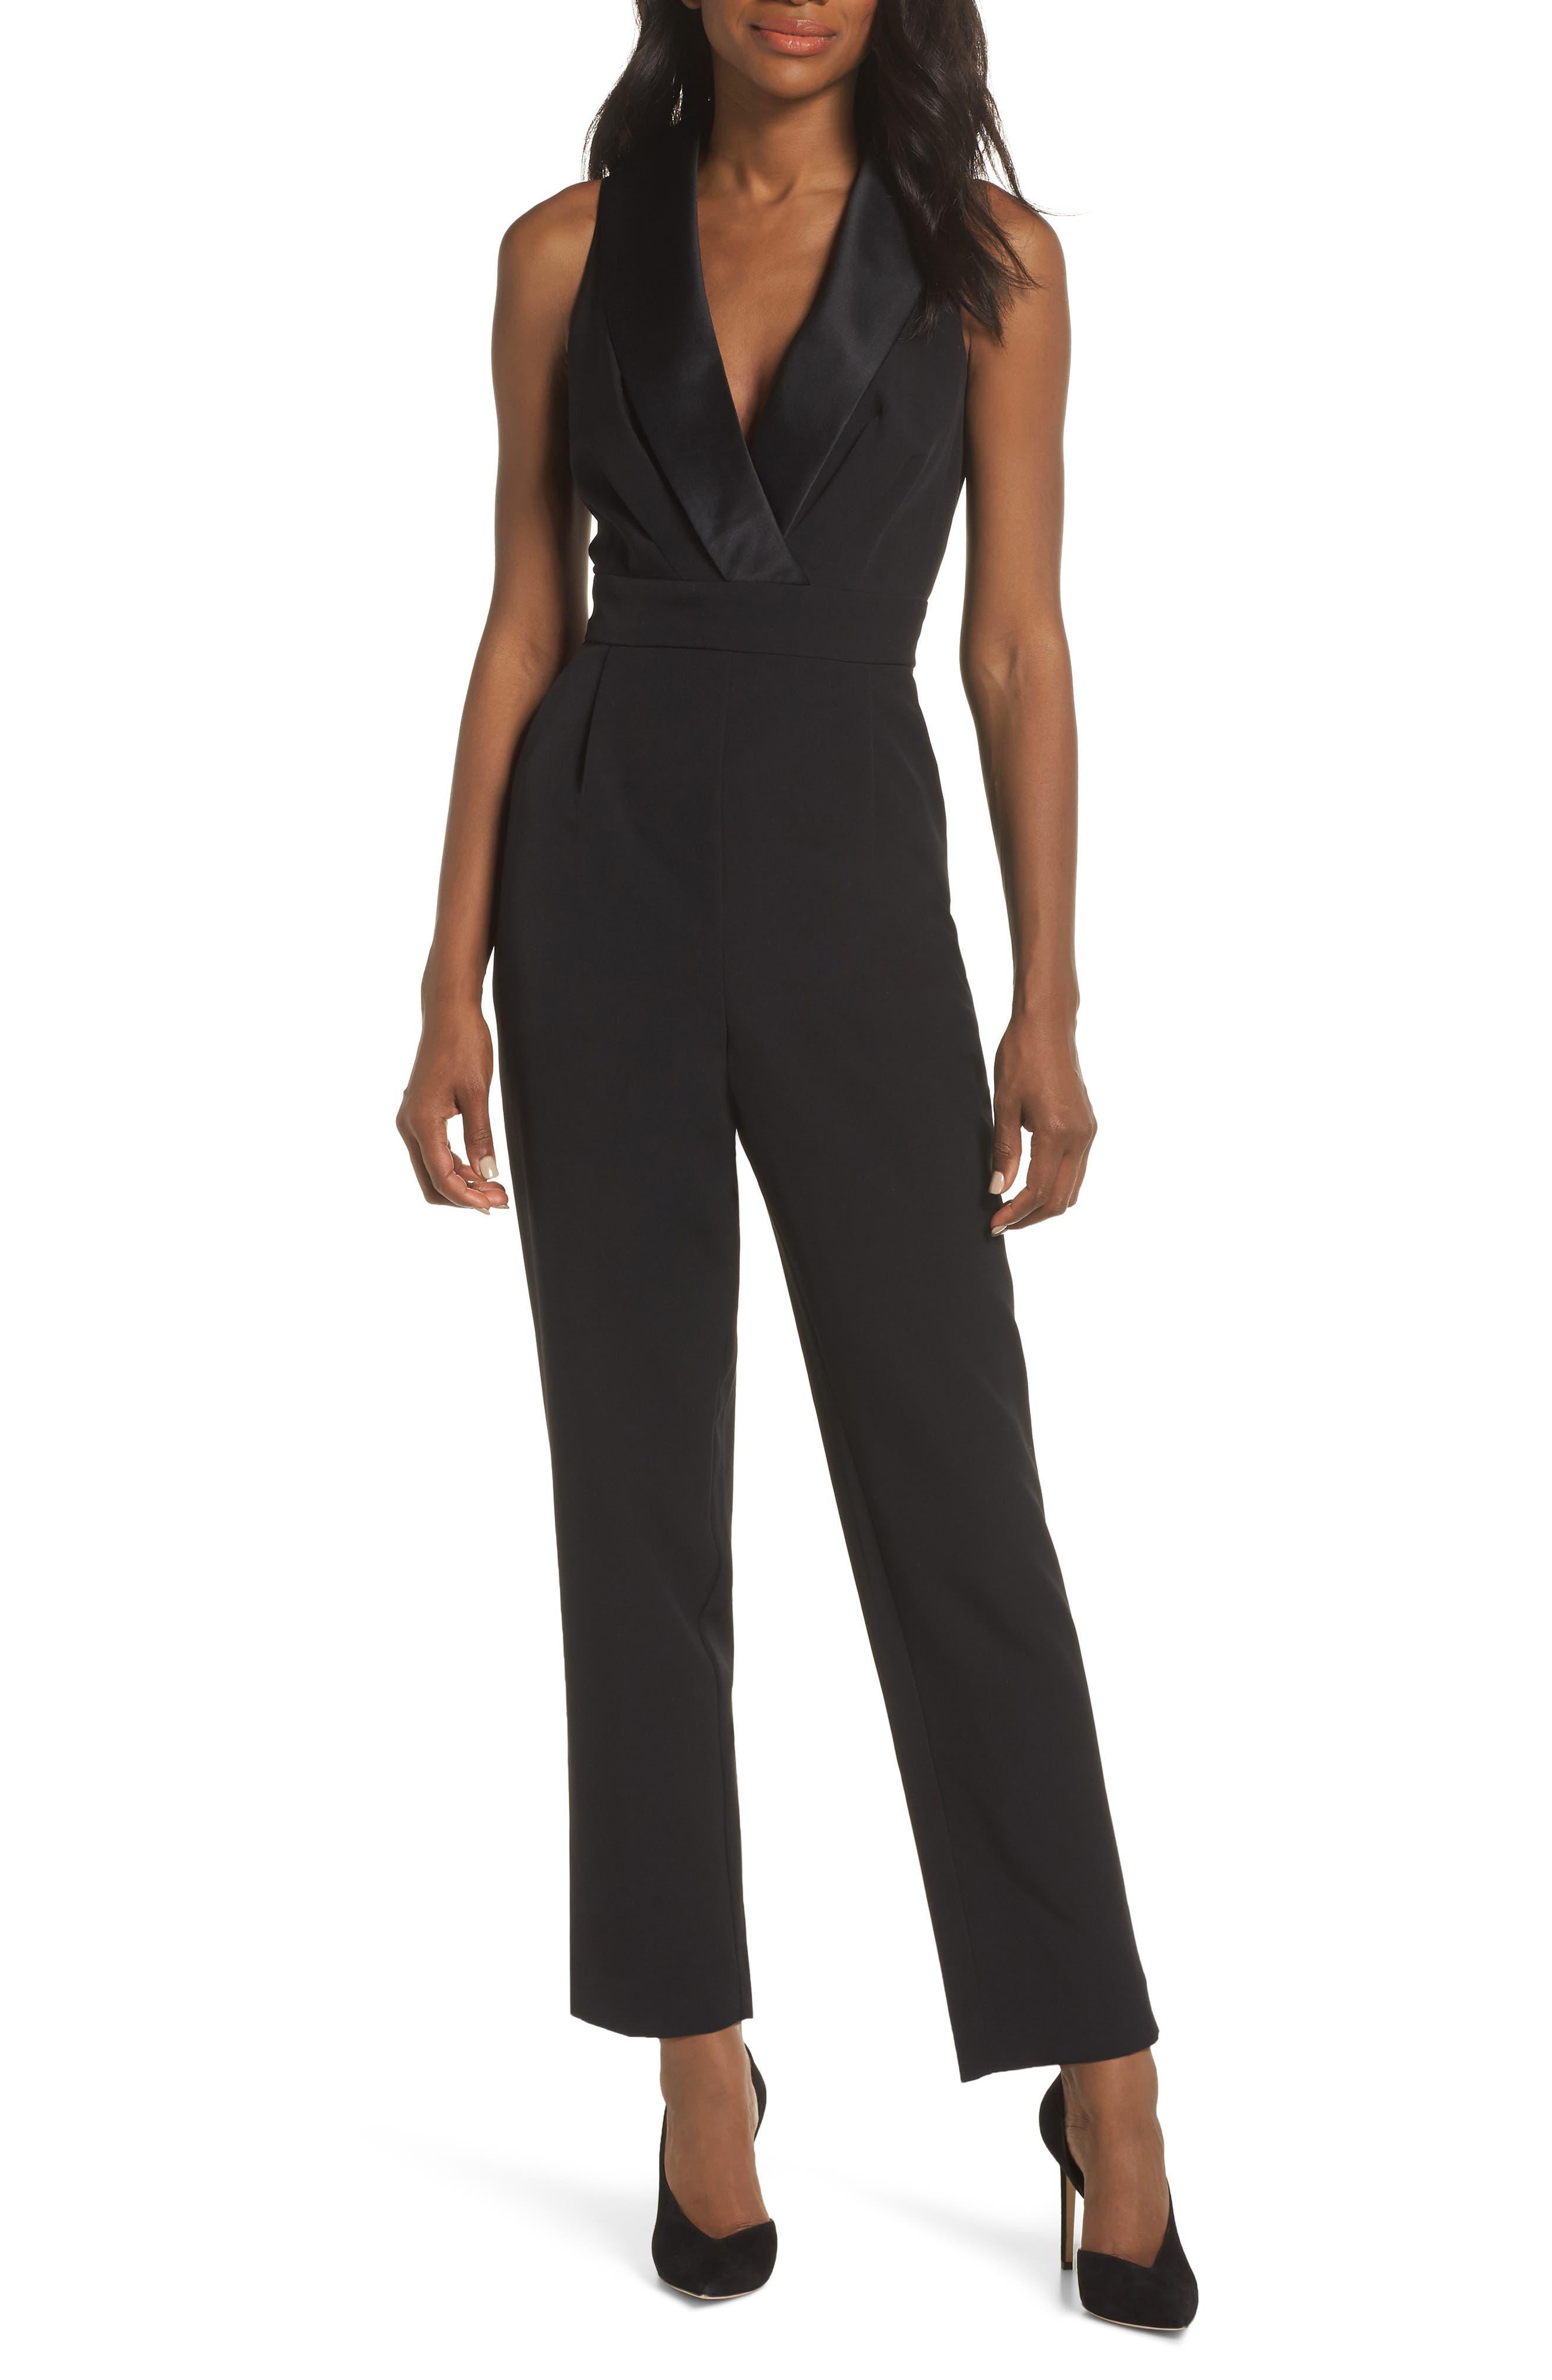 ELIZA J, Tuxedo Jumpsuit, Main thumbnail 1, color, BLACK